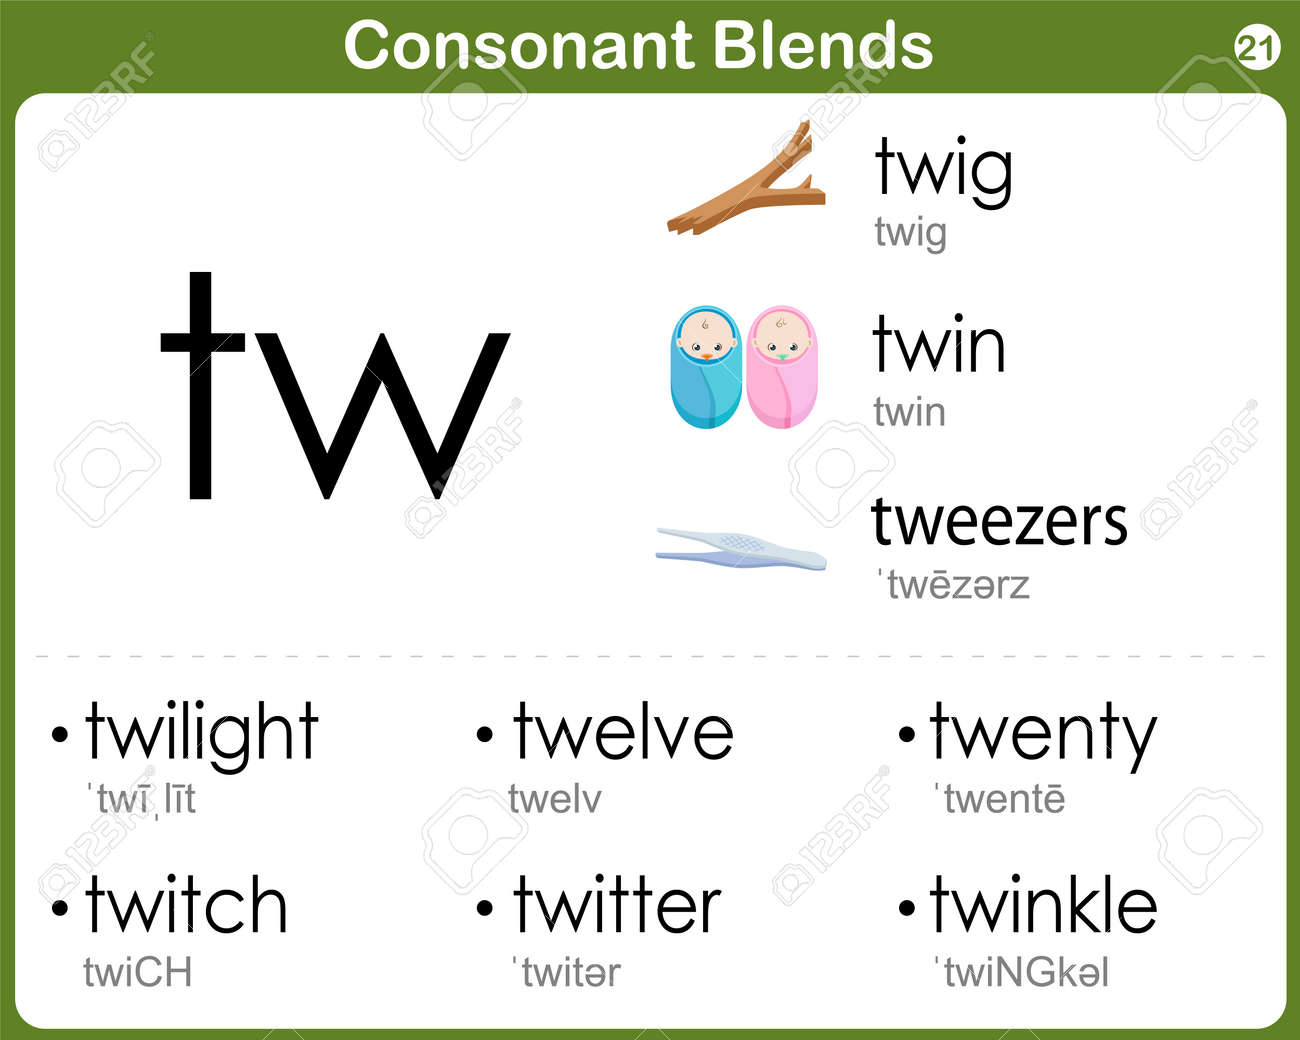 Worksheets Consonant Blends Worksheets consonant blends worksheet for kids royalty free cliparts vectors stock vector 36646109